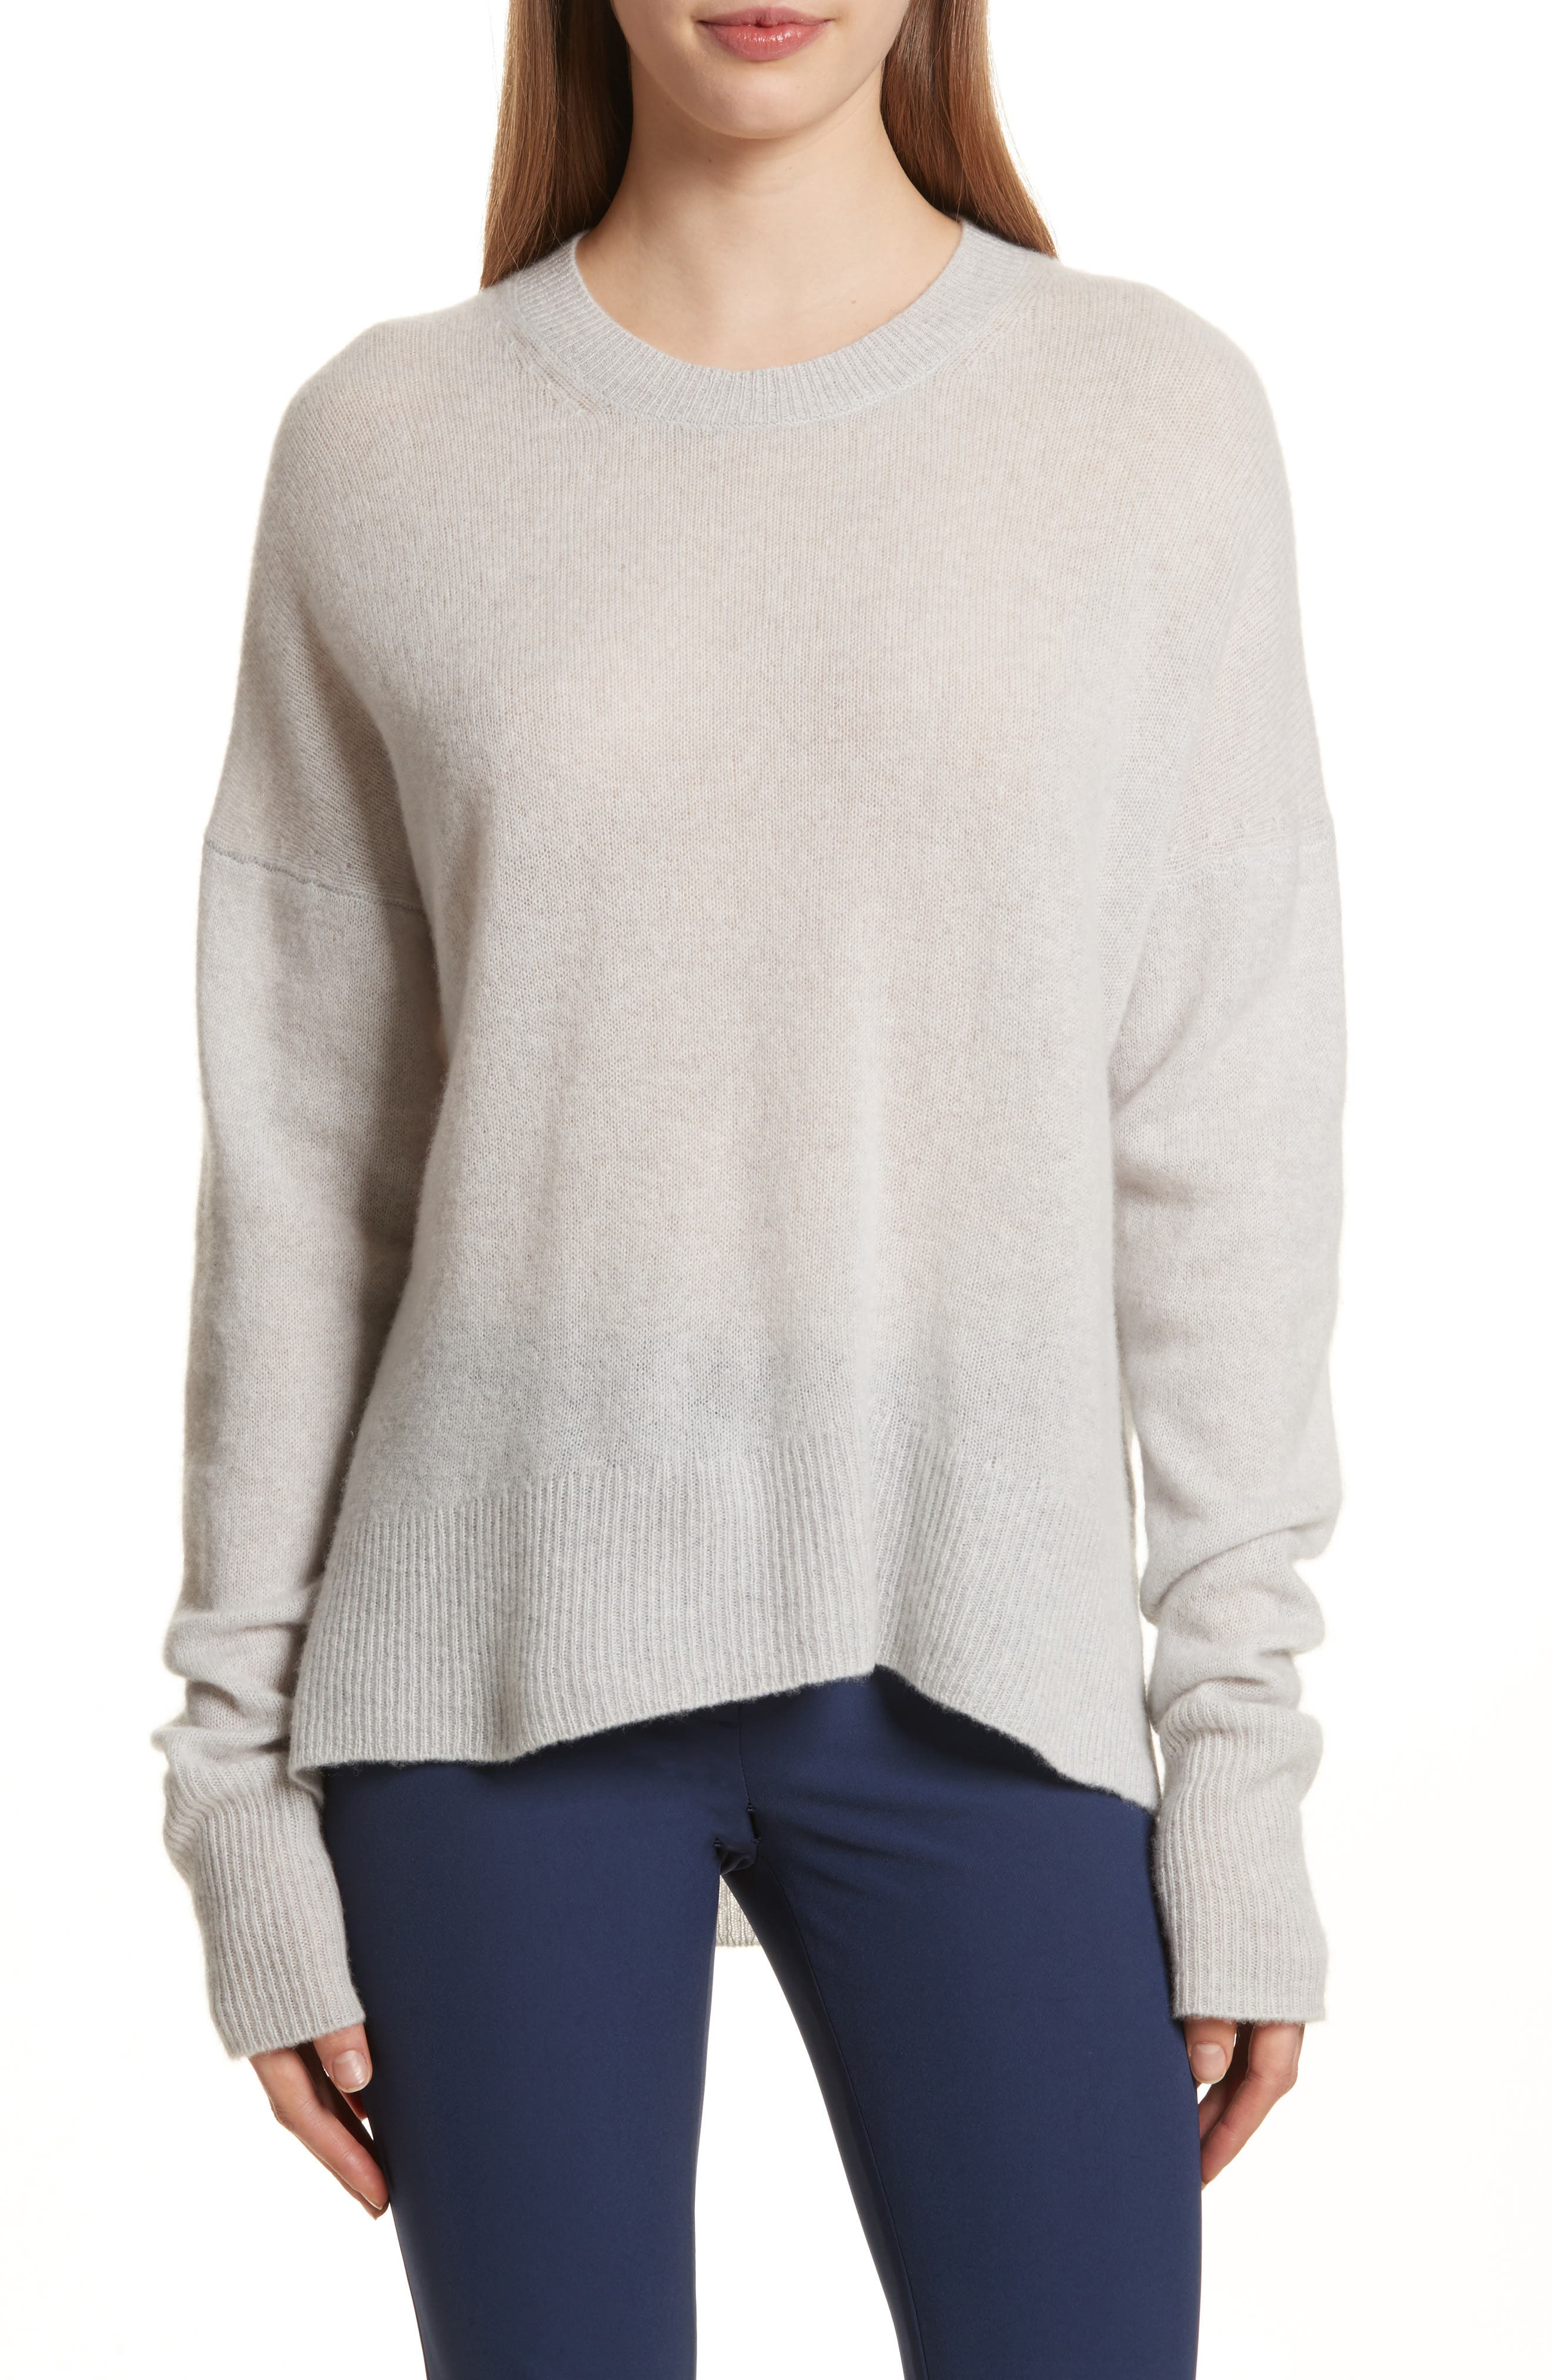 Karenia L Cashmere Sweater,                             Main thumbnail 2, color,